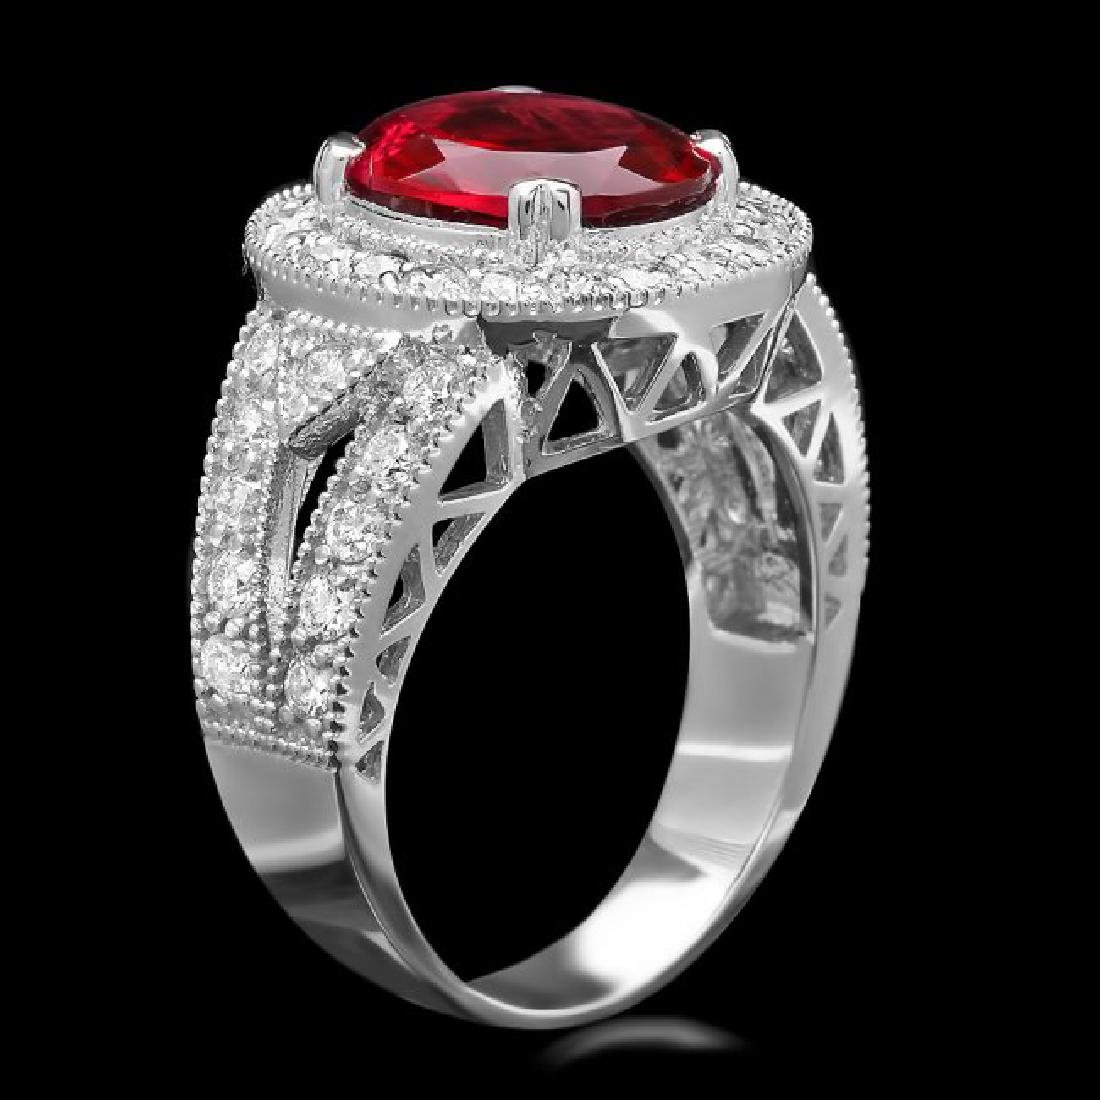 14k Gold 3.20ct Tourmaline 1.35ct Diamond Ring - 2